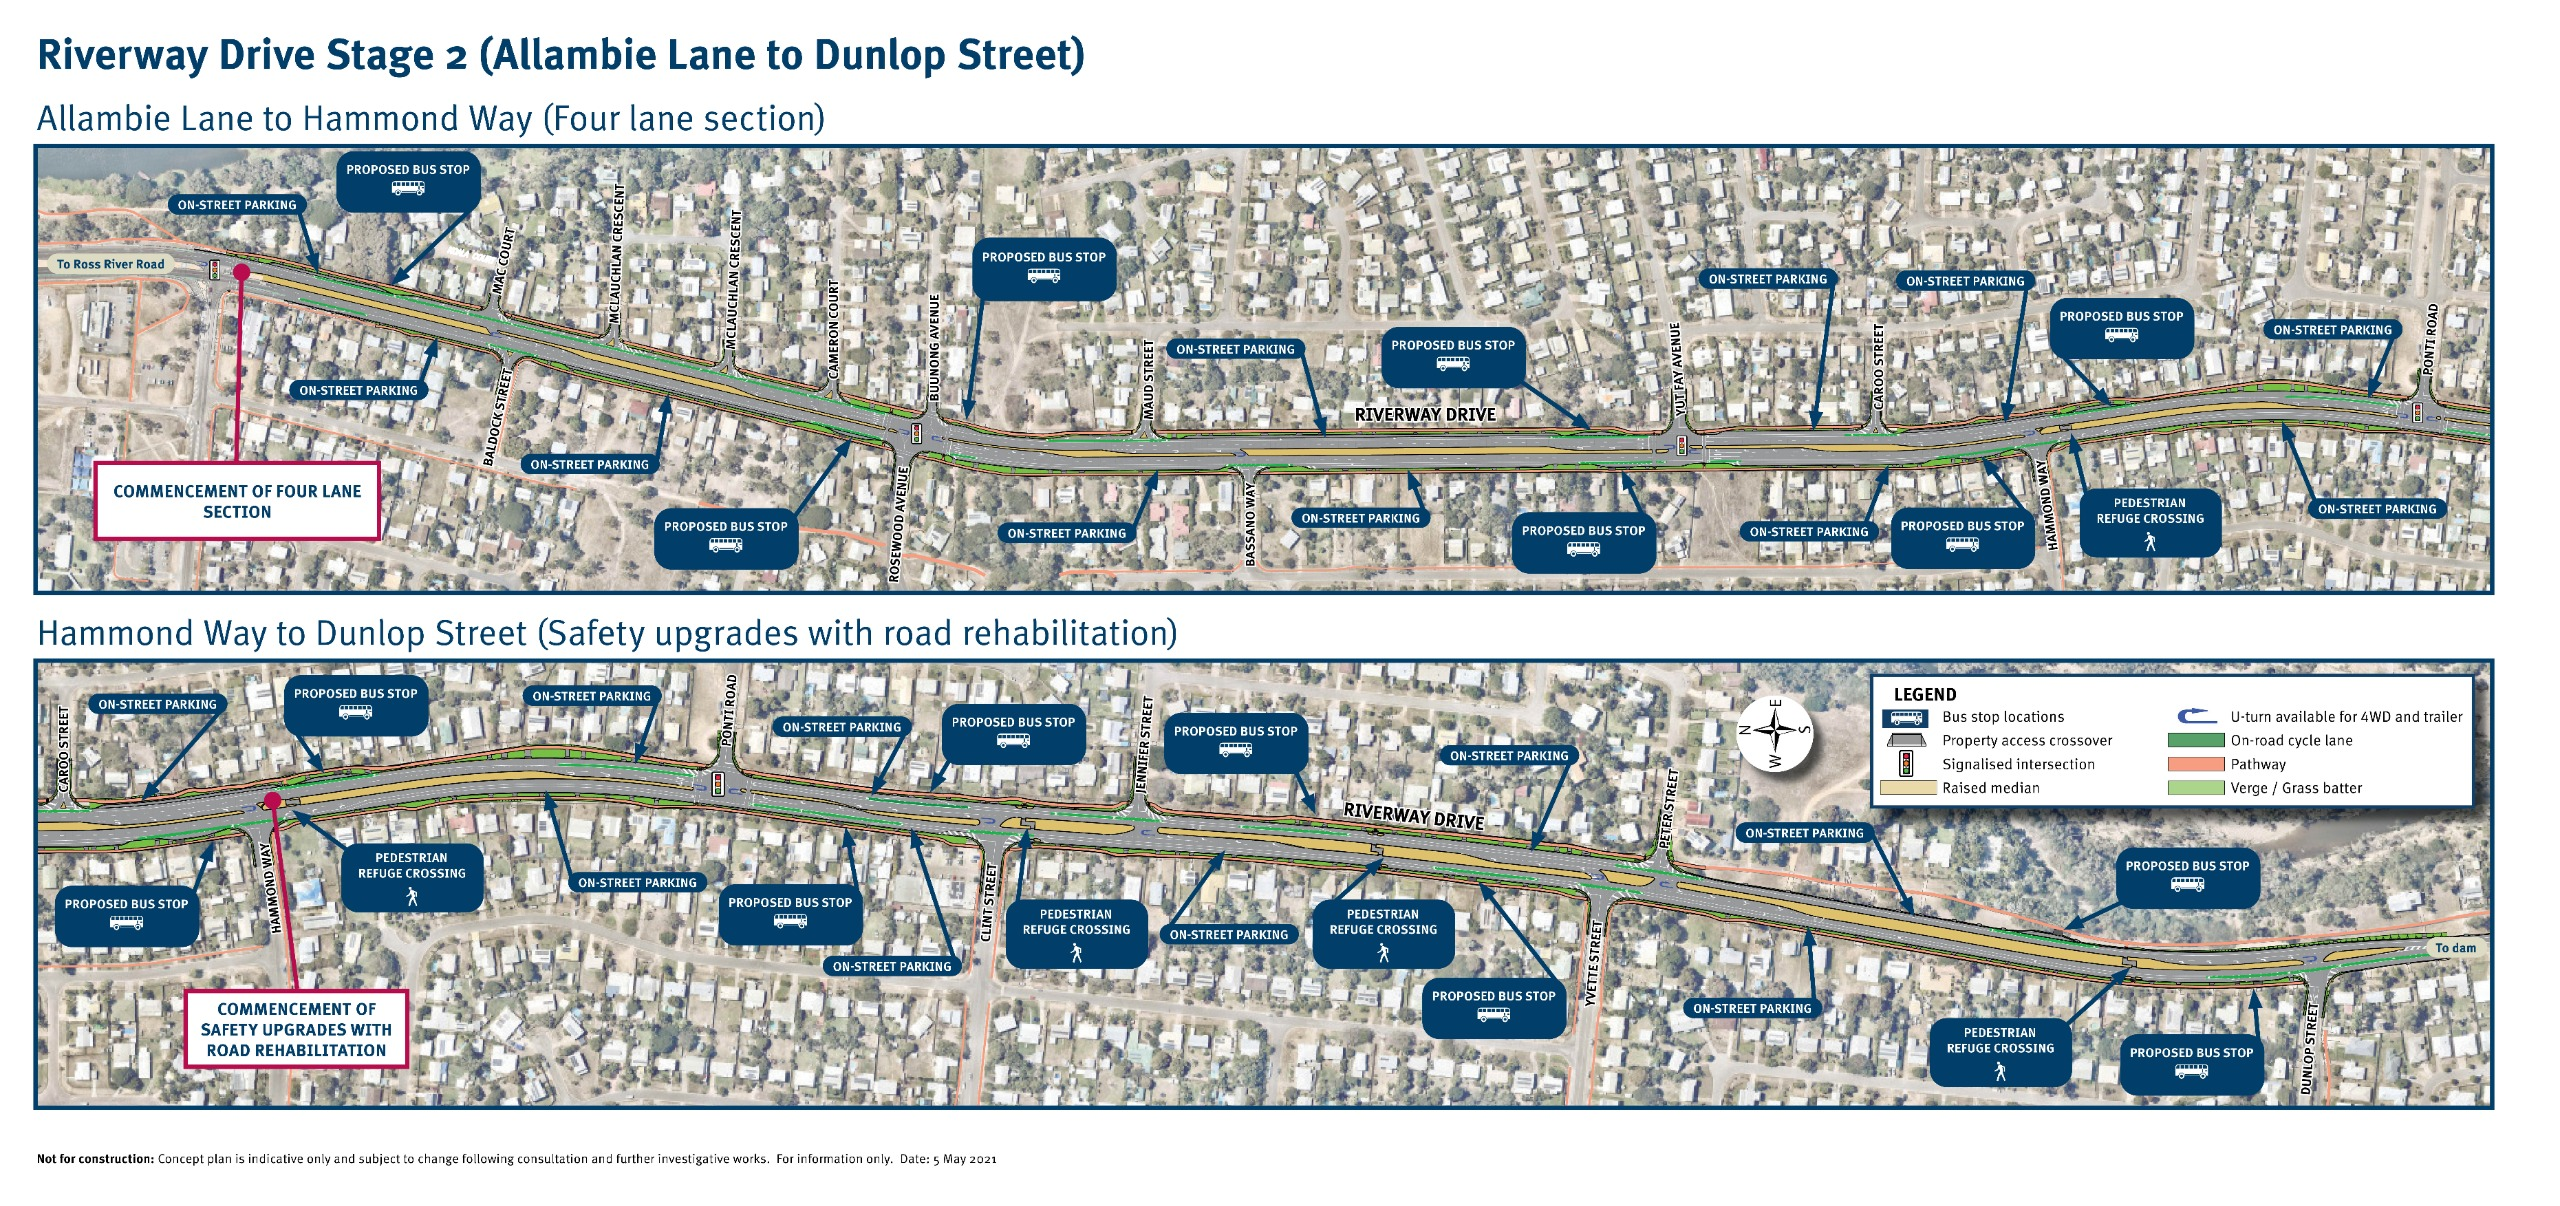 Riverway Drive Stage 2 (Allambie Lane to Dunlop Street)